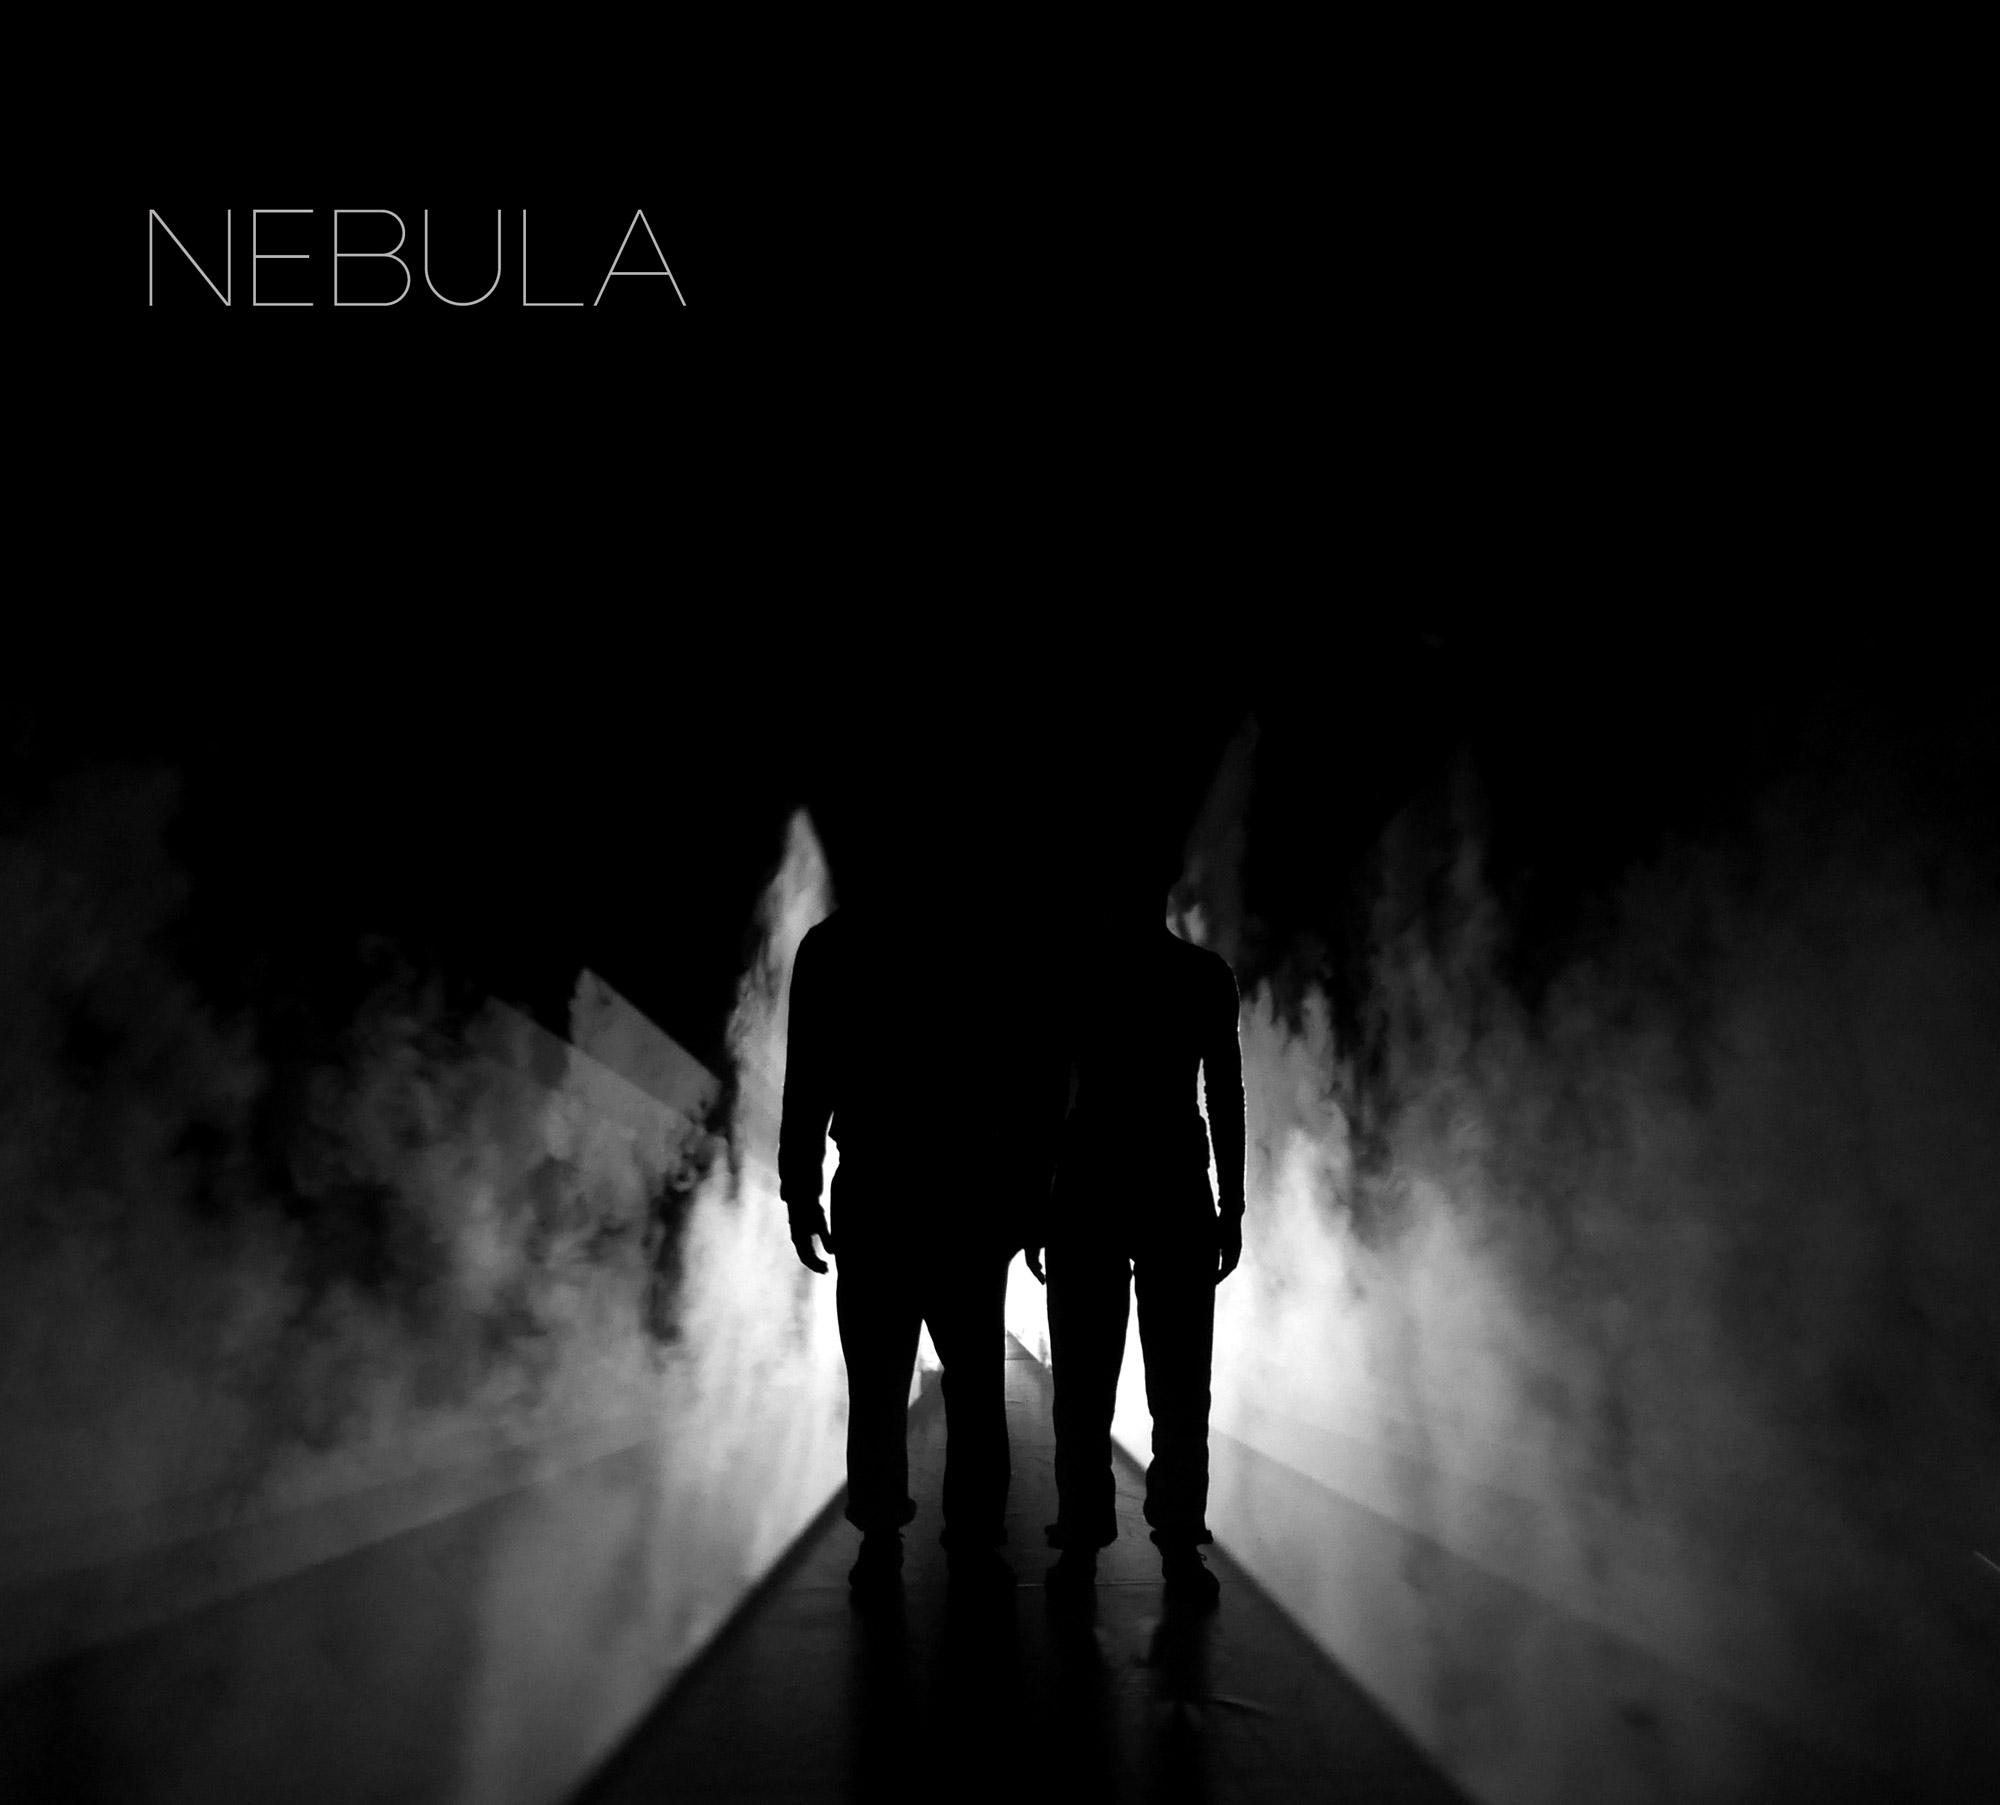 nebula-6bis-vasil-tasevski